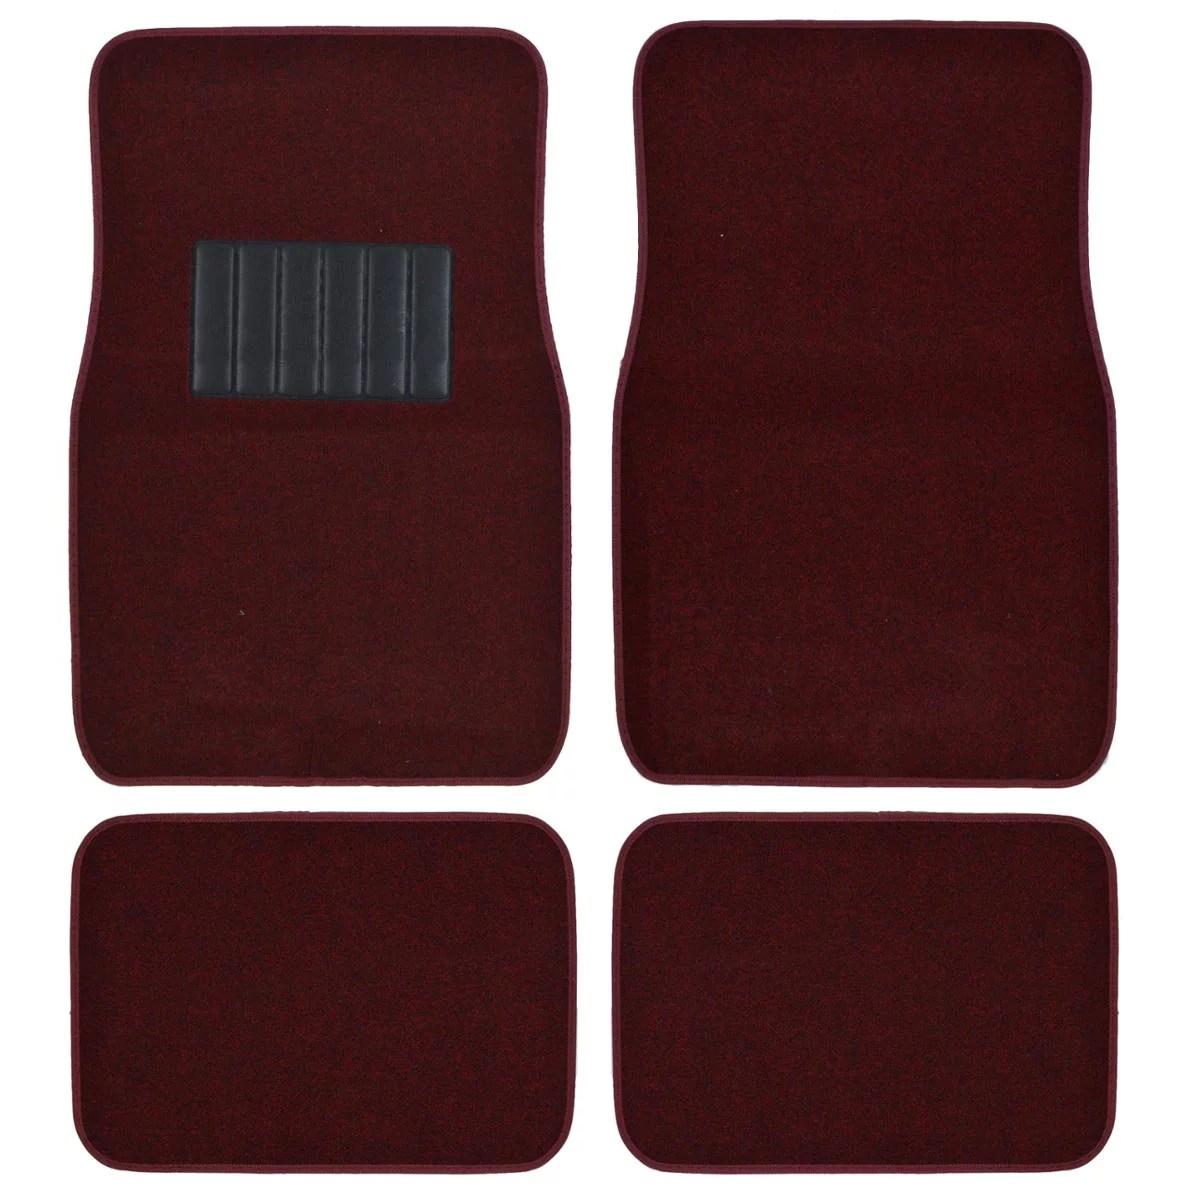 hight resolution of bdk car floor mats 4 pieces carpet protection universal fit for car suv va truck front rear walmart com